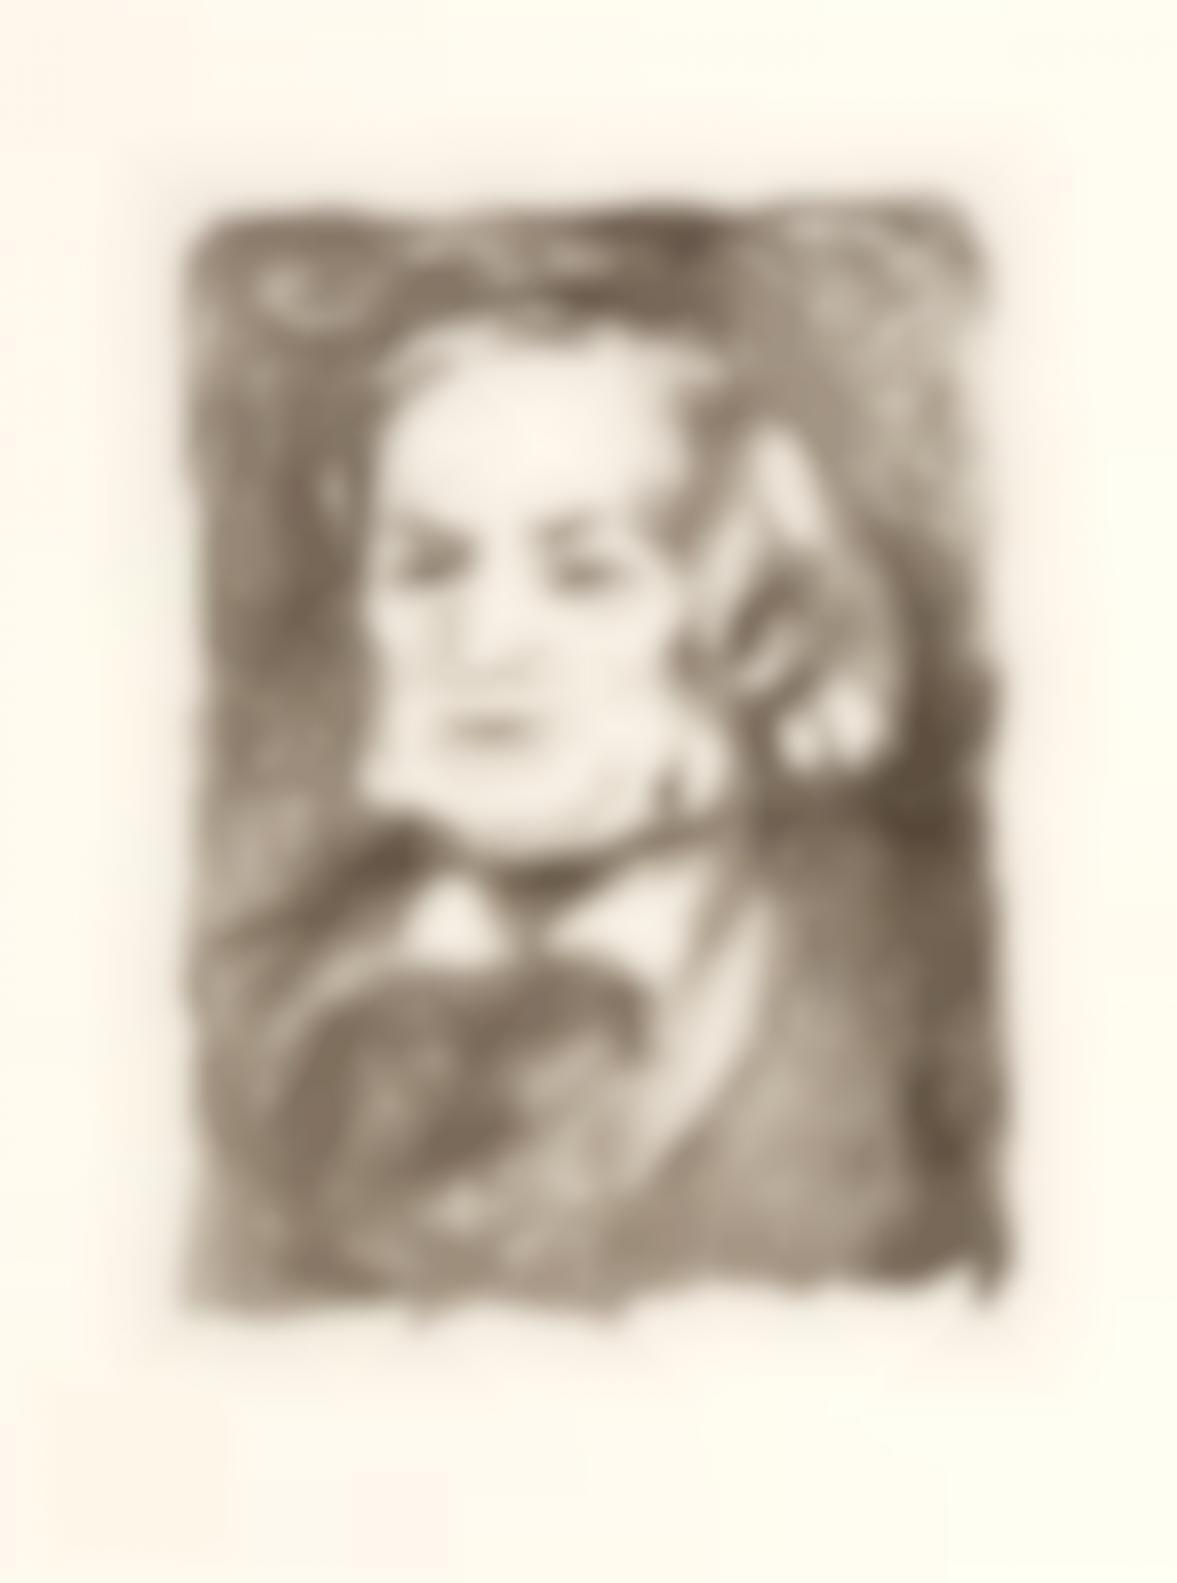 Pierre-Auguste Renoir-Richard Wagner (D. 23), C. 1900-1900